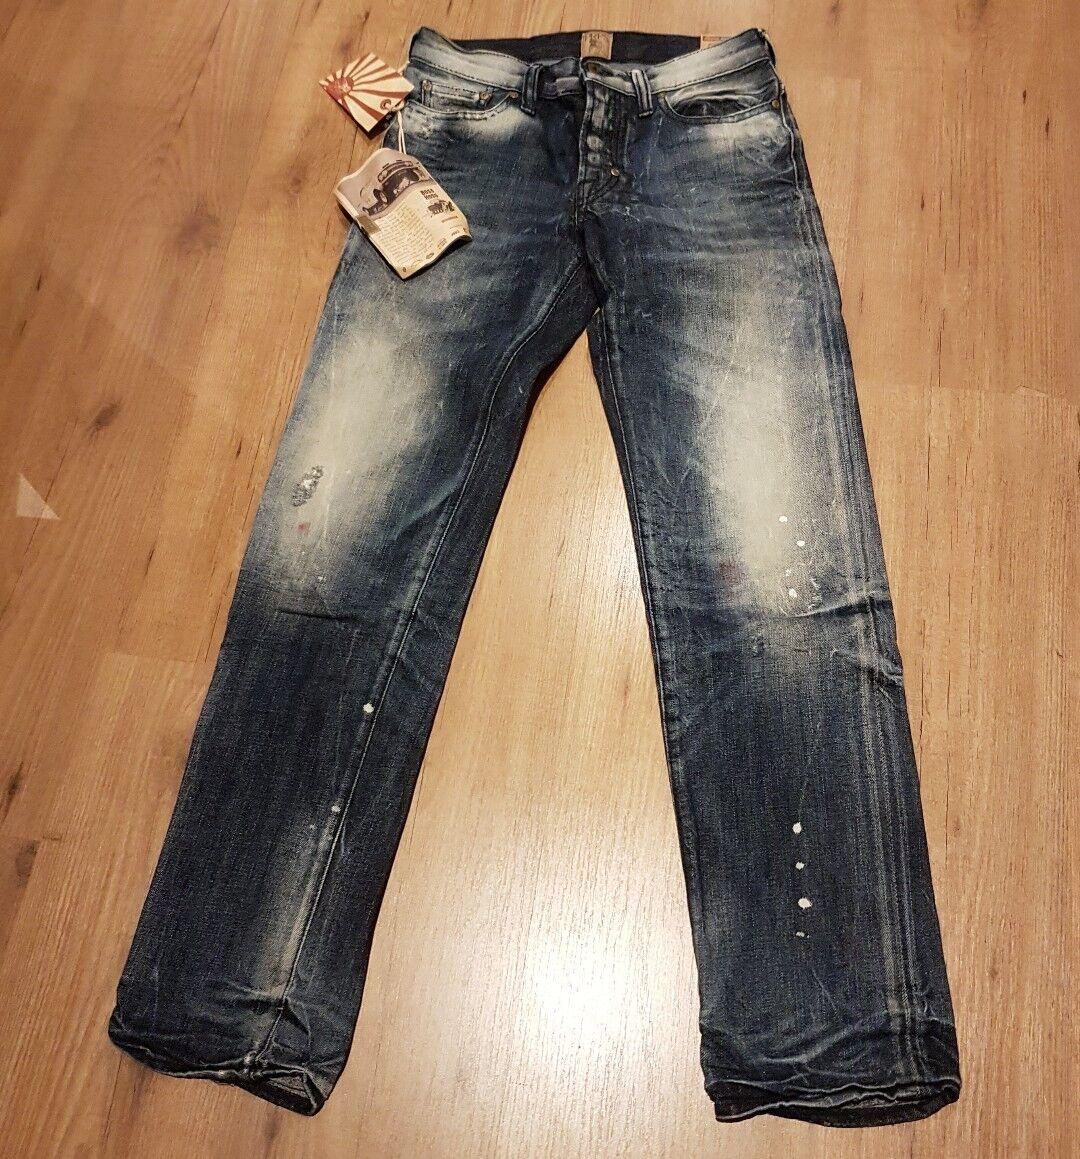 PRPS Goods and Co. Rambler Indigo RWP Jeans